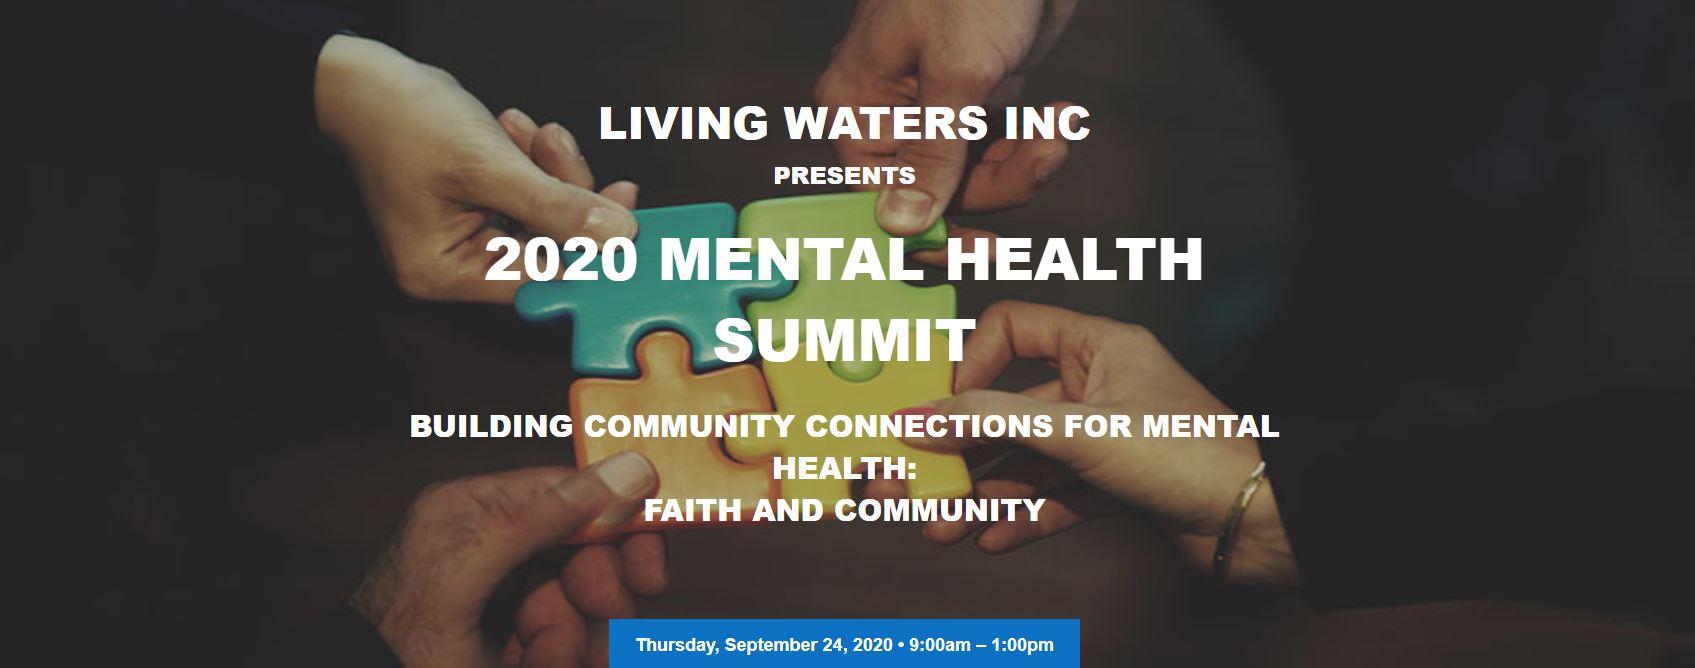 2020 Mental Health Summit